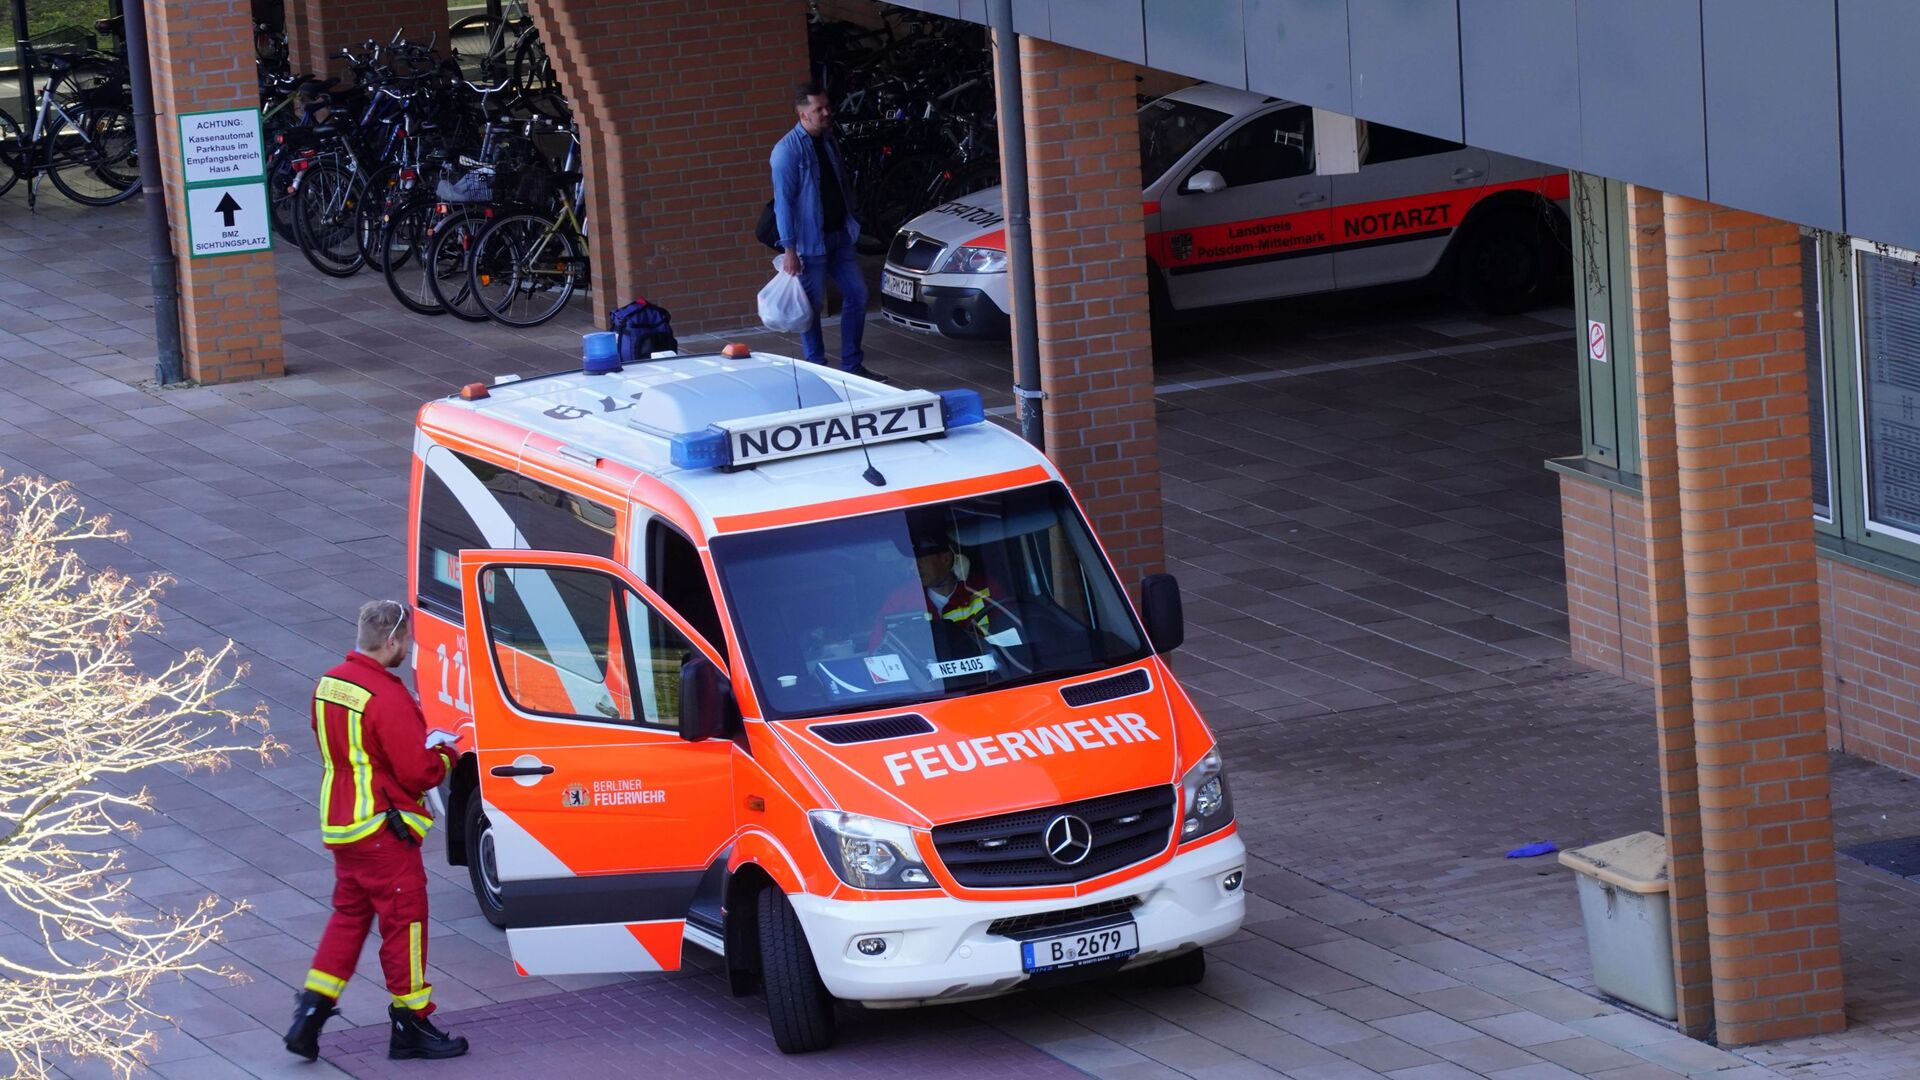 Ambulanza a Berlino, Germania - Sputnik Italia, 1920, 30.07.2021